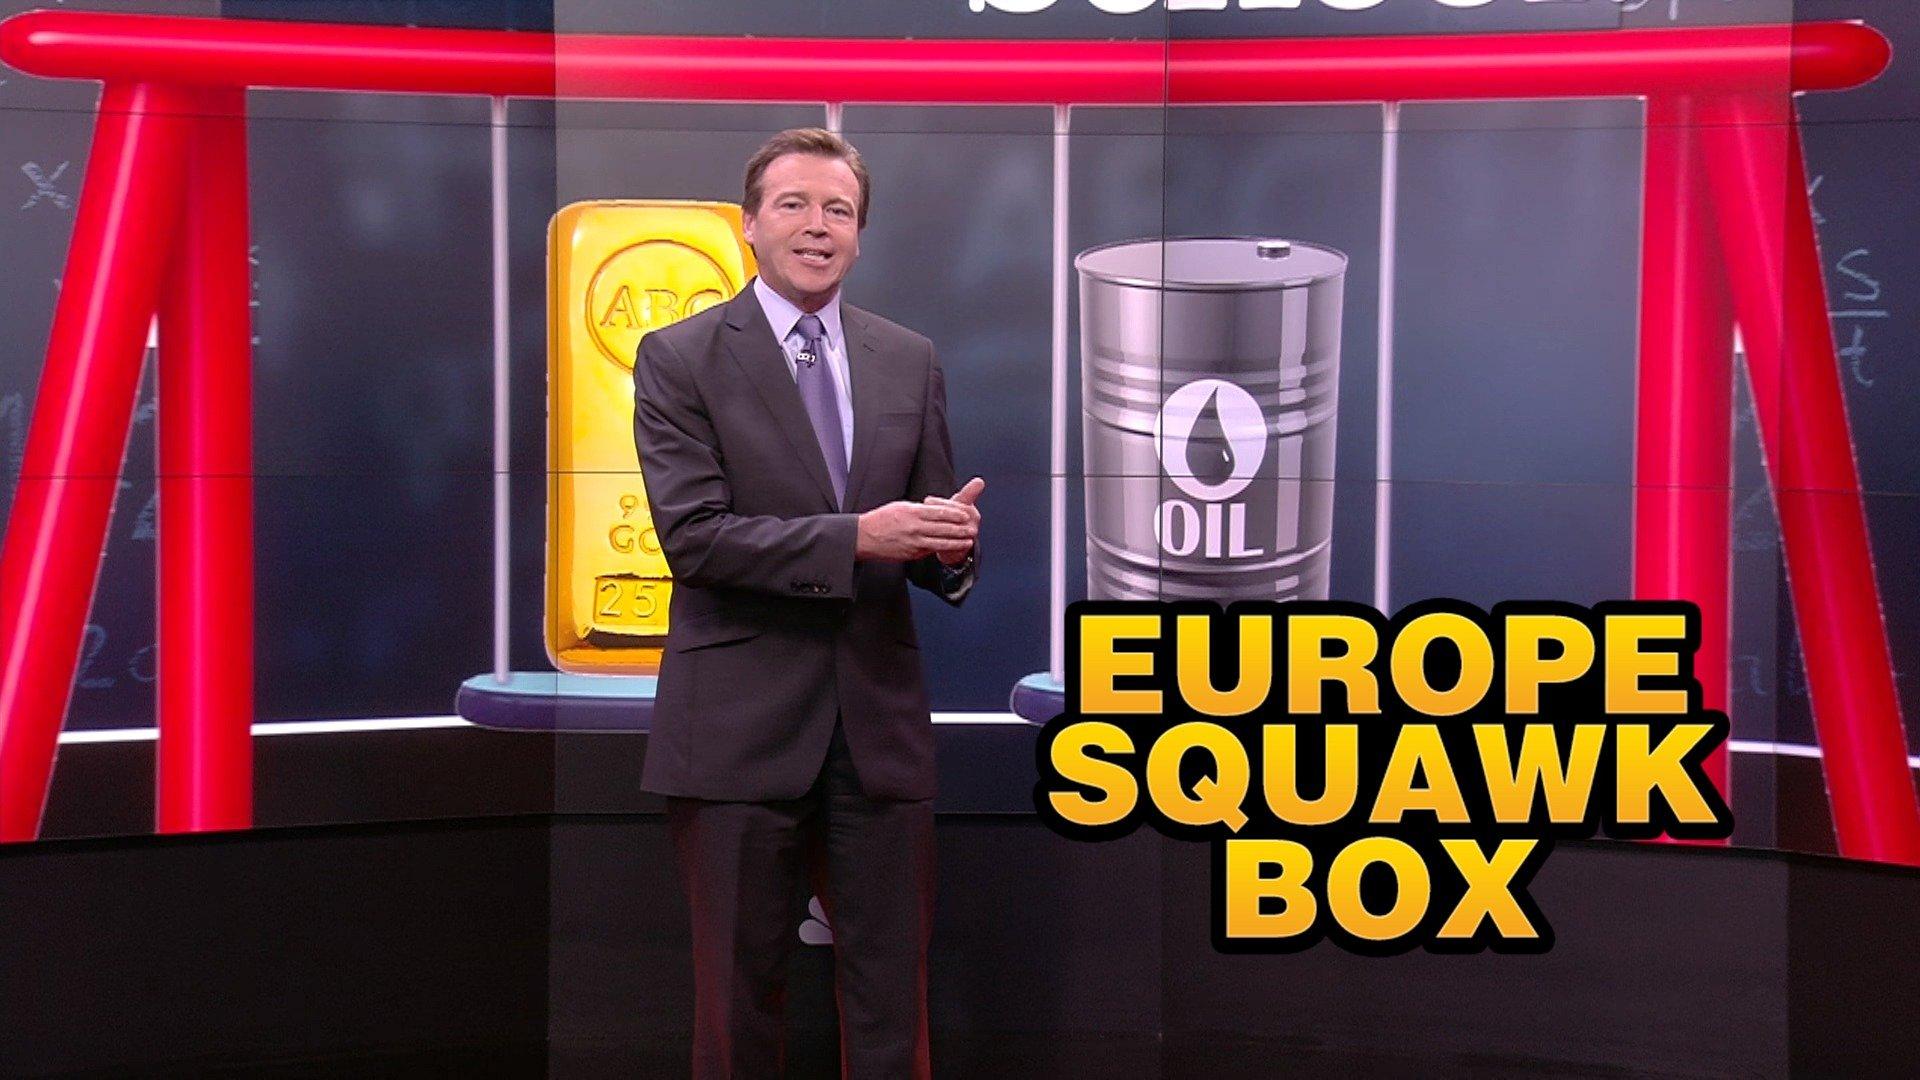 Europe Squawk Box